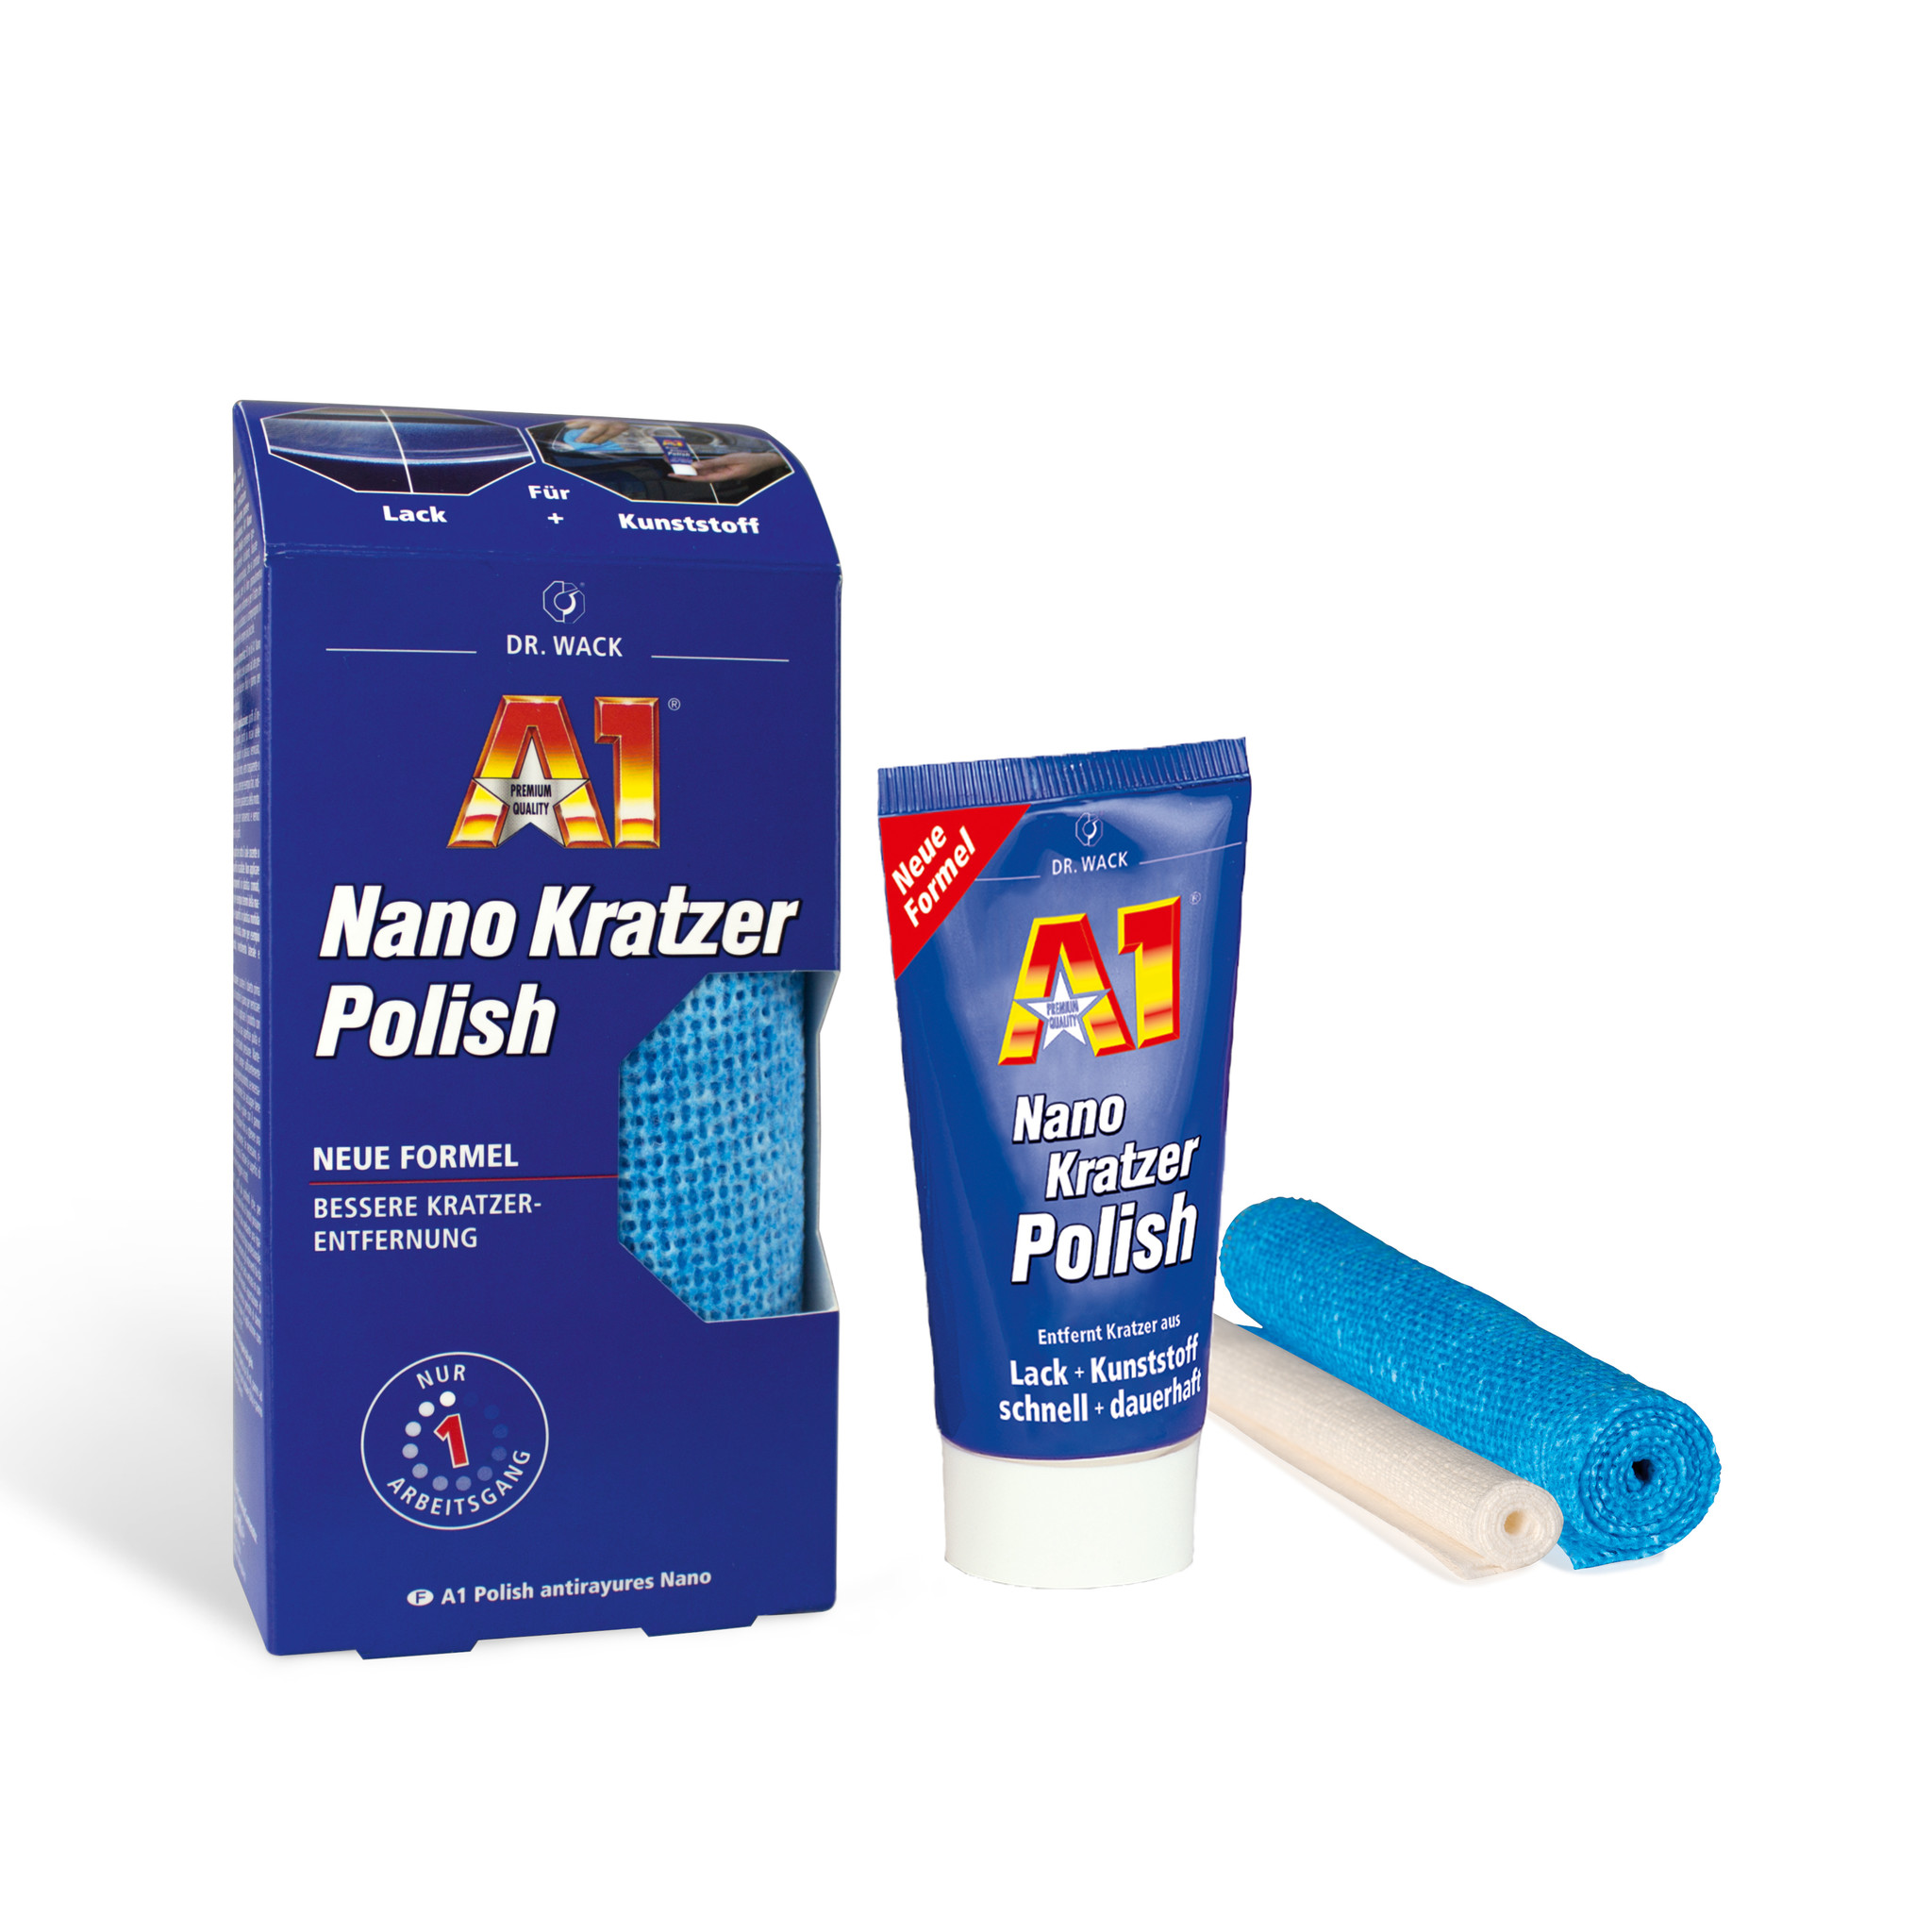 Dr. Wack Dr. Wack A1 Nano Kratzer Polish